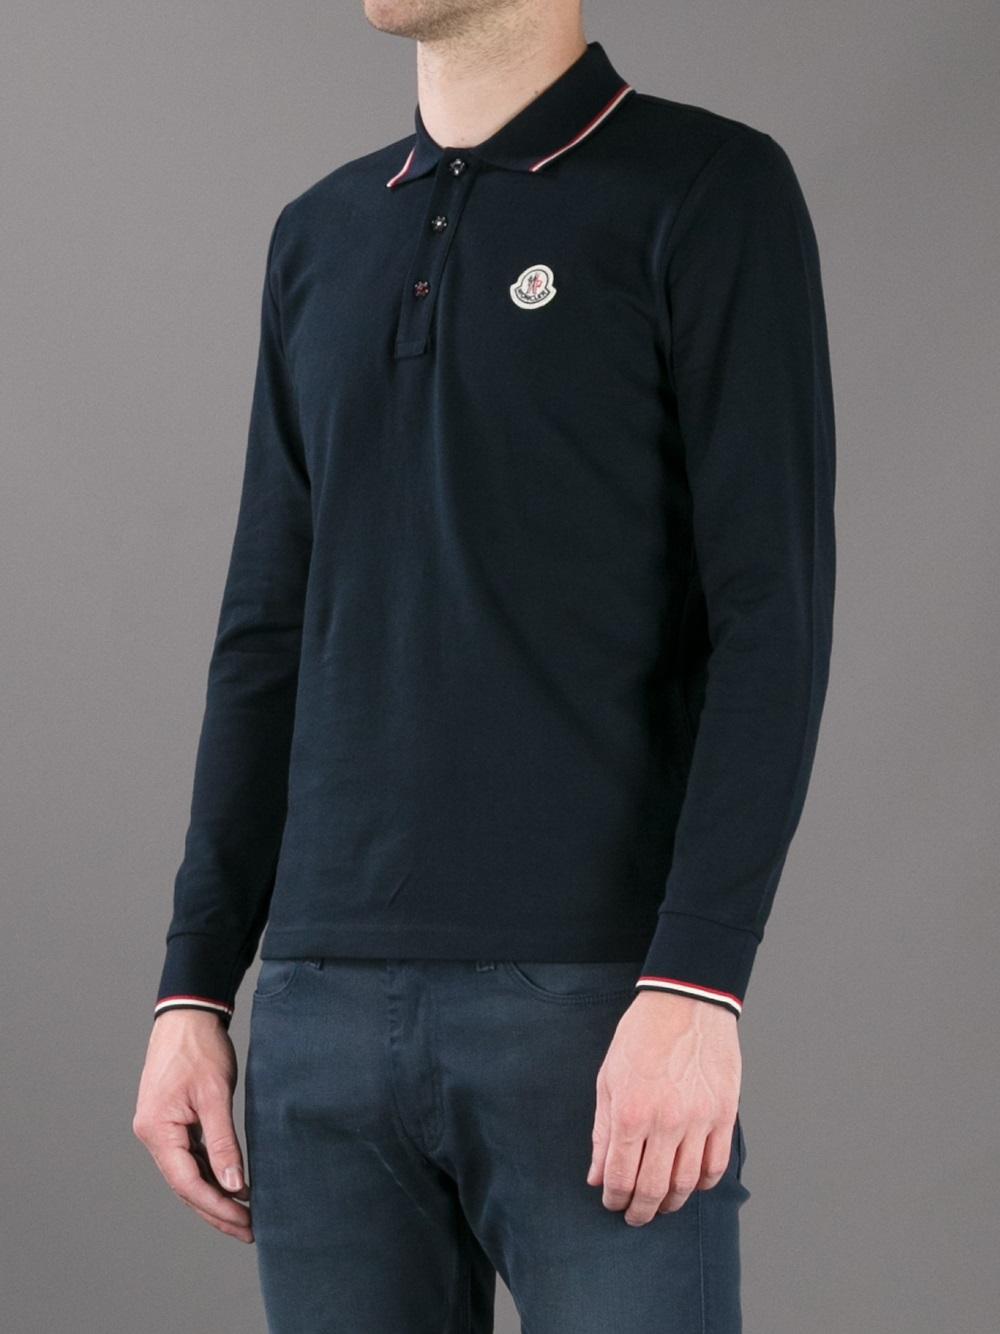 Long Sleeve Polo Shirt For Sale Rldm